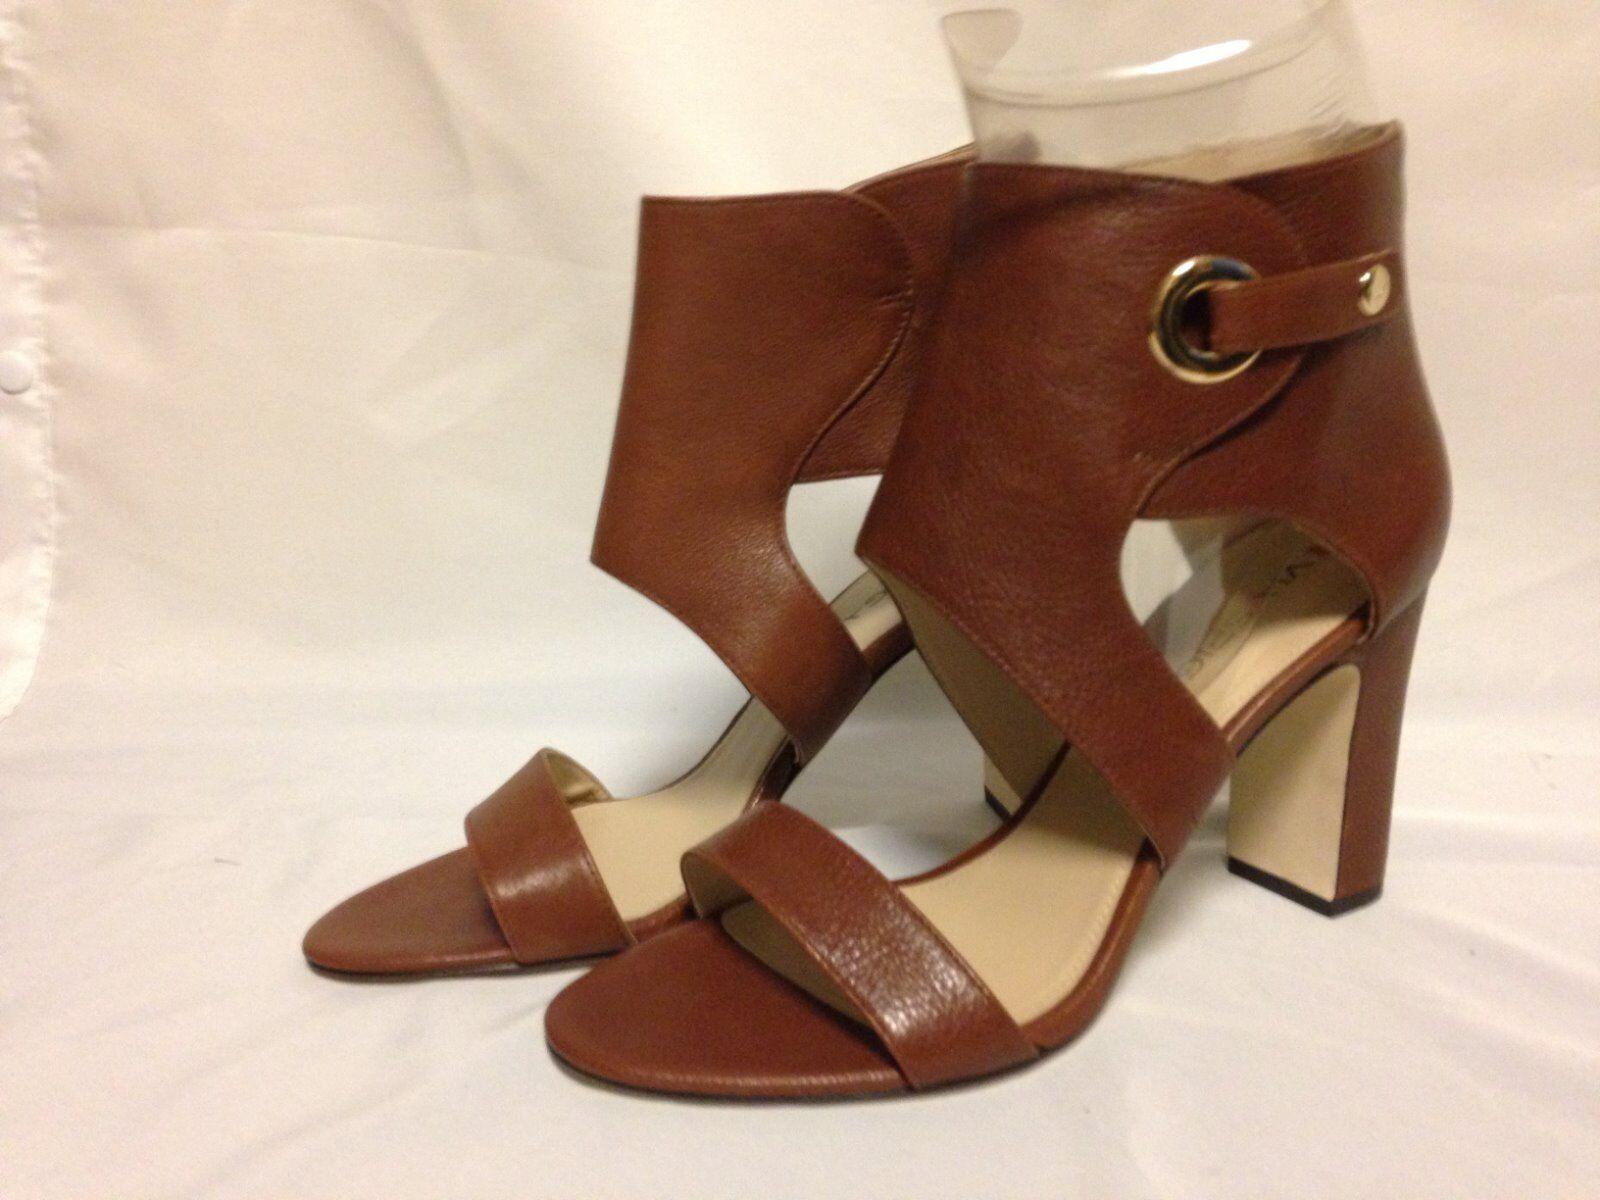 Via Spiga Adra Ankle Sandal 8.5 9 M Russet Leather MISMATES New w  Defect